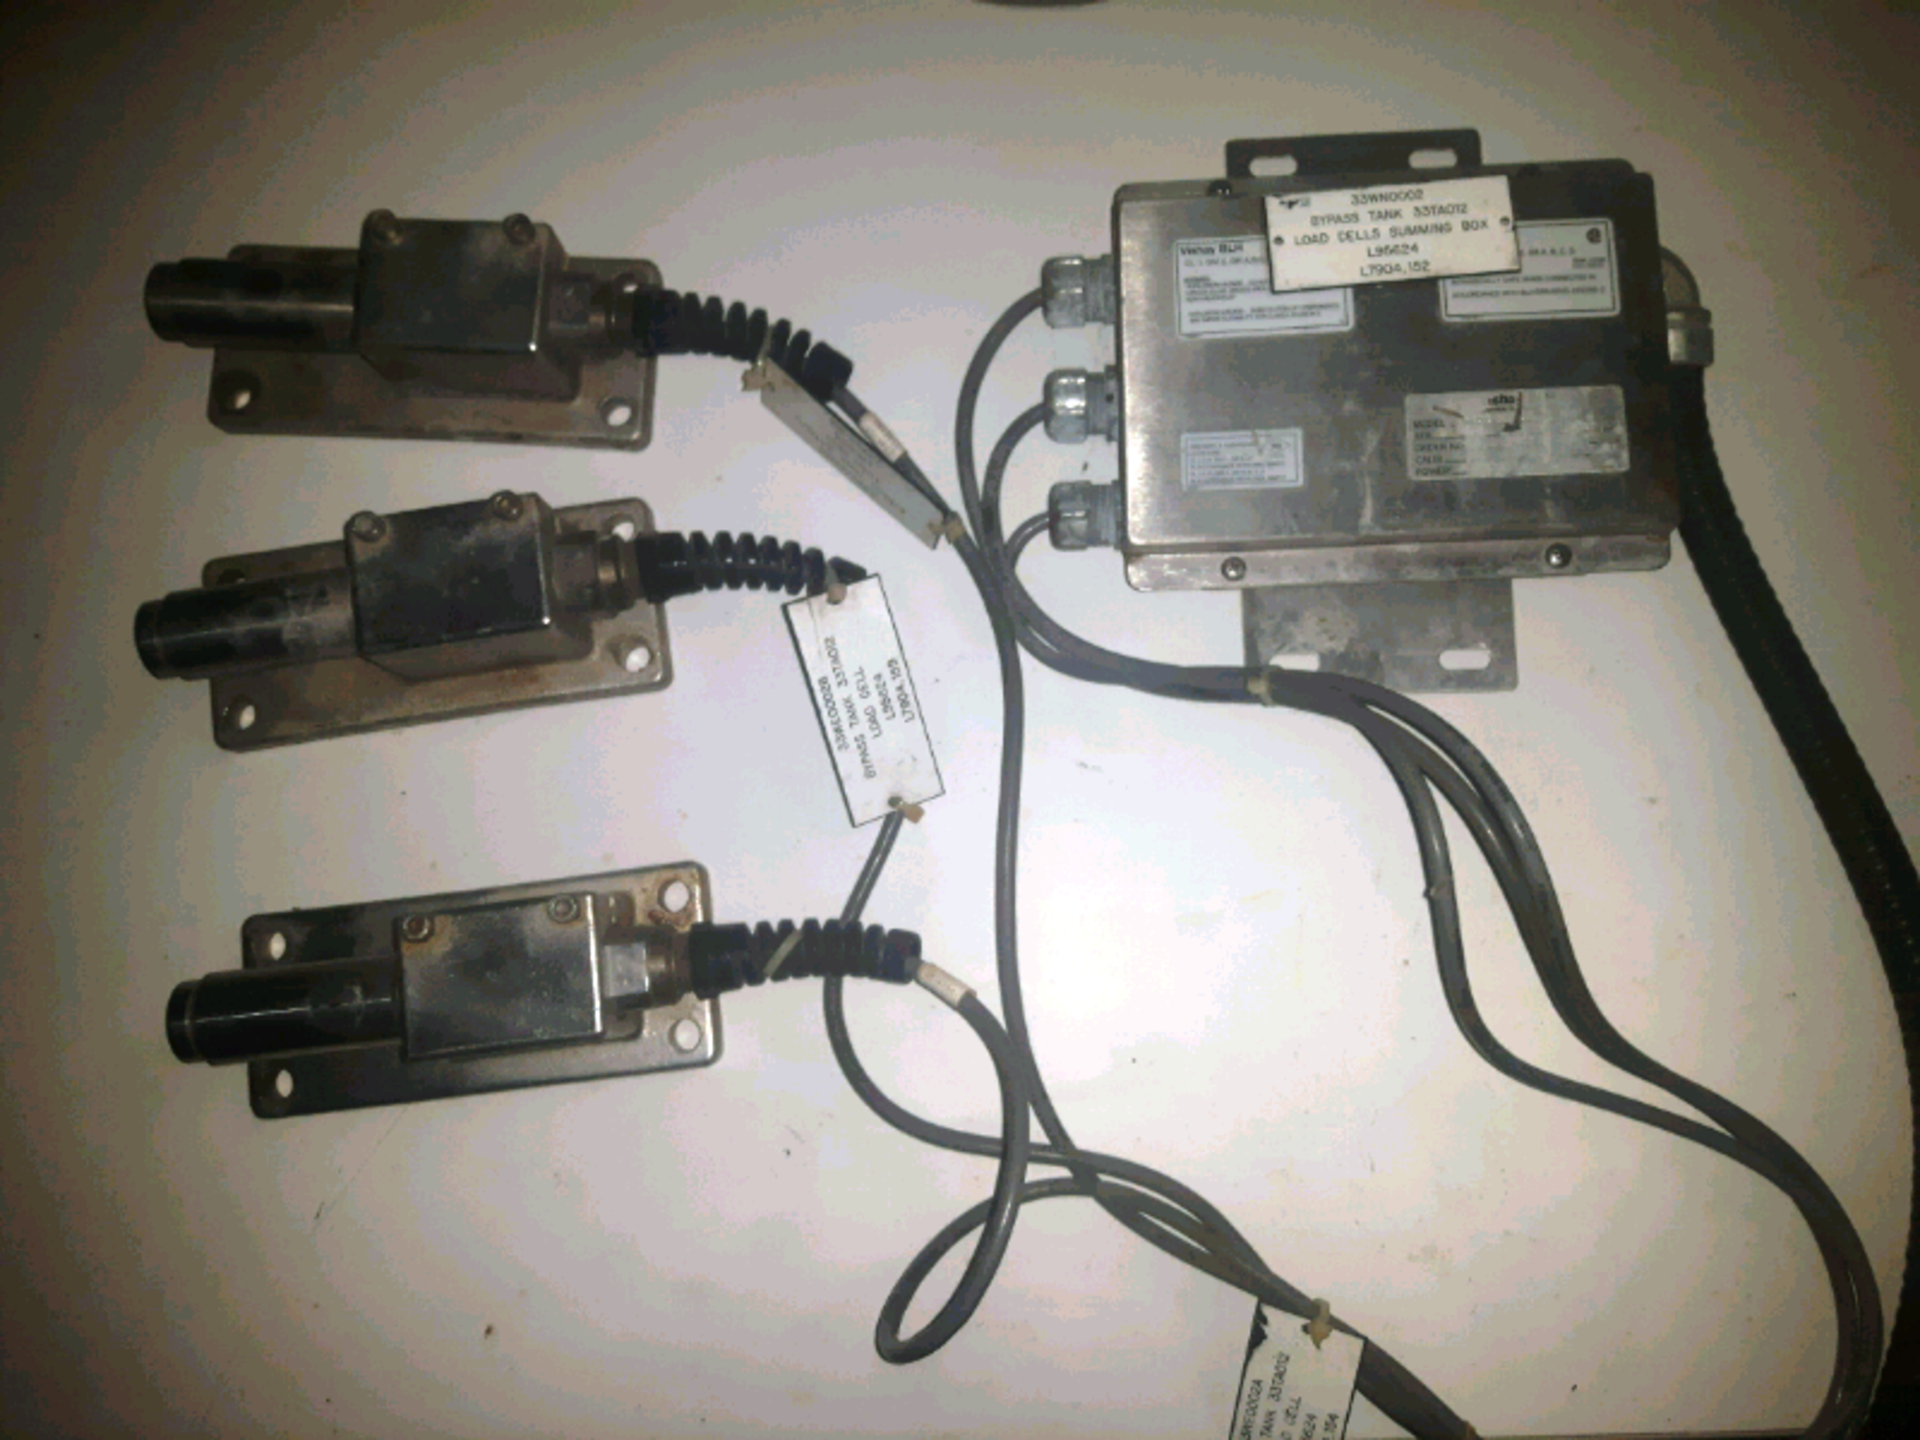 Vishay Kis 2 Load Cells w/Summing Box, S/N #469357, Capacity 450lbs - LOCATION - LONDON, ONTARIO